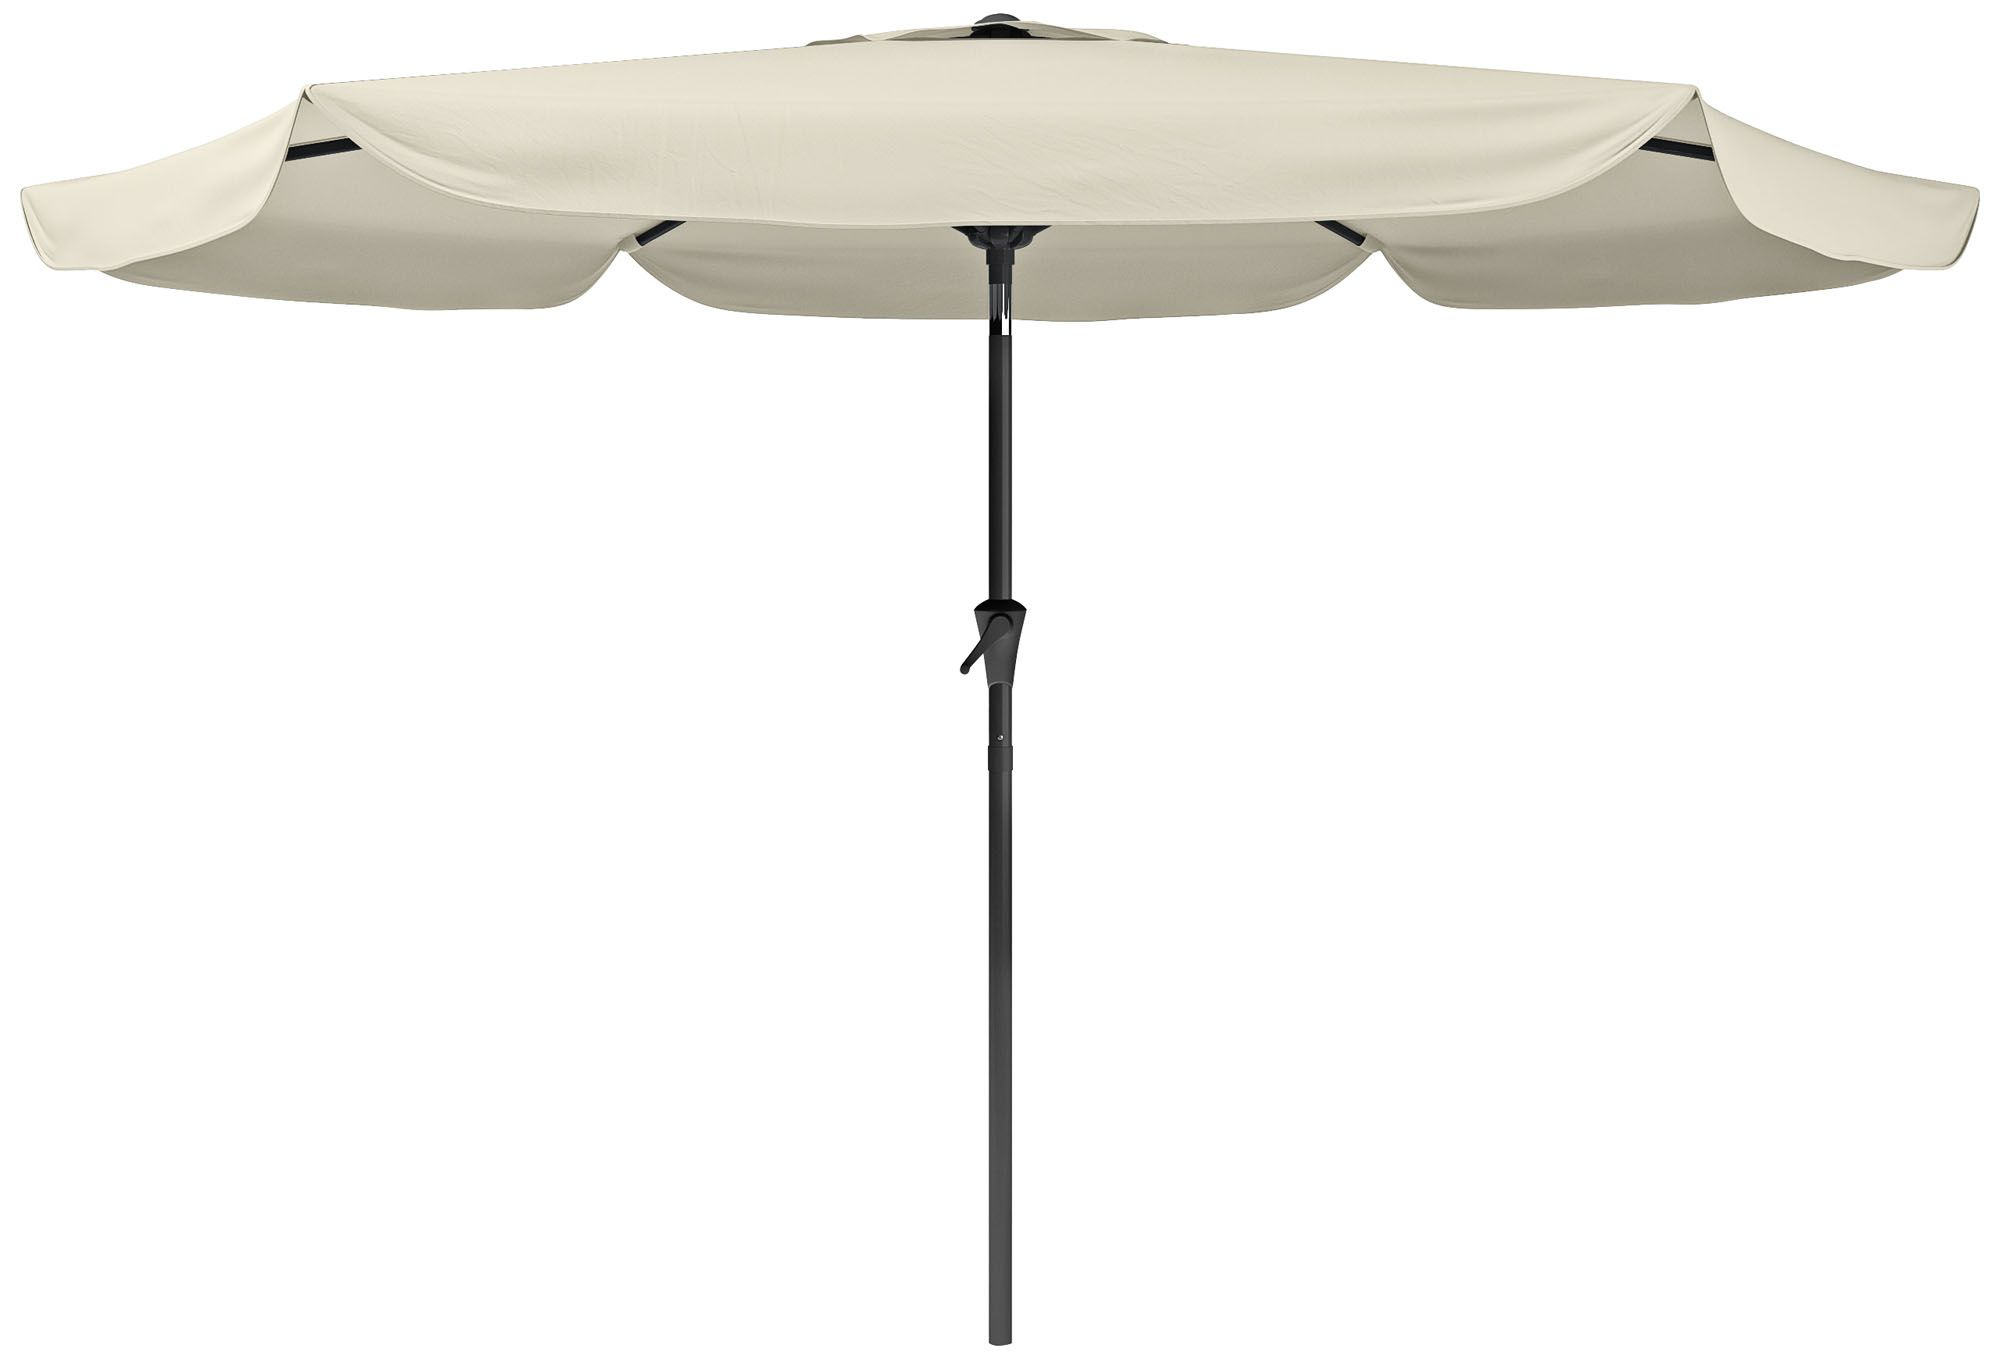 Hoba 9 3/4 Foot Warm White Fabric Tilting Patio Umbrella